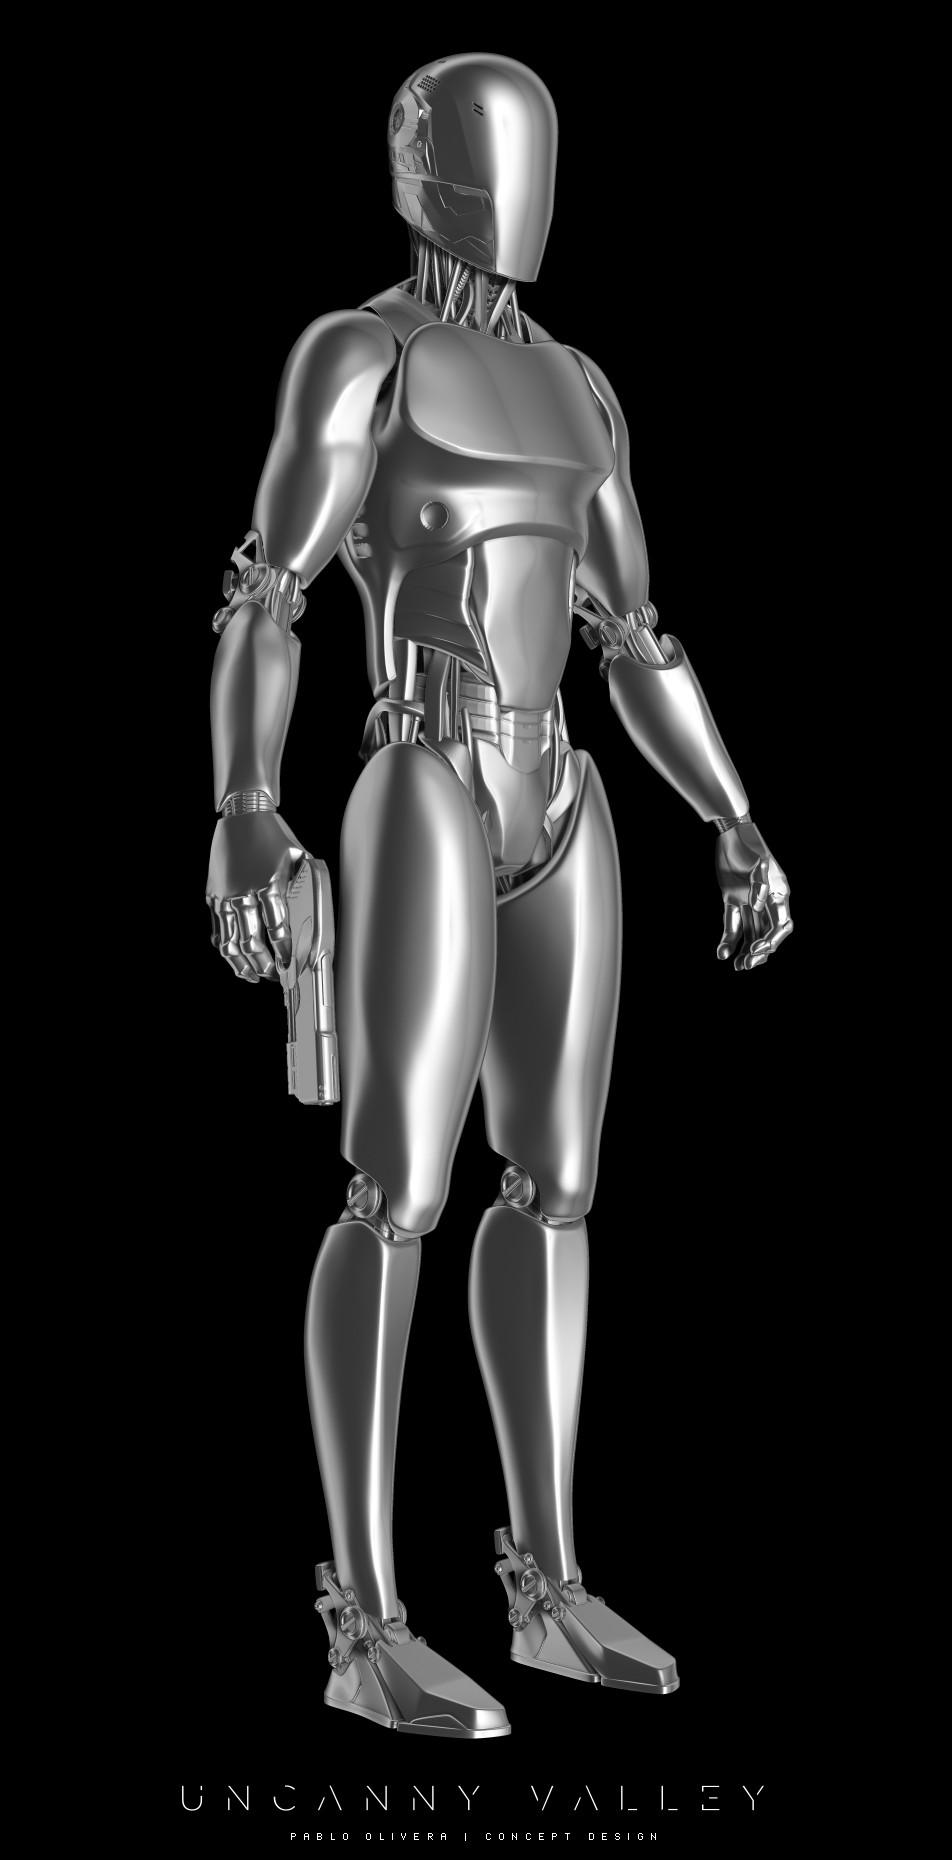 Pablo olivera uncanny valley character design robot 02